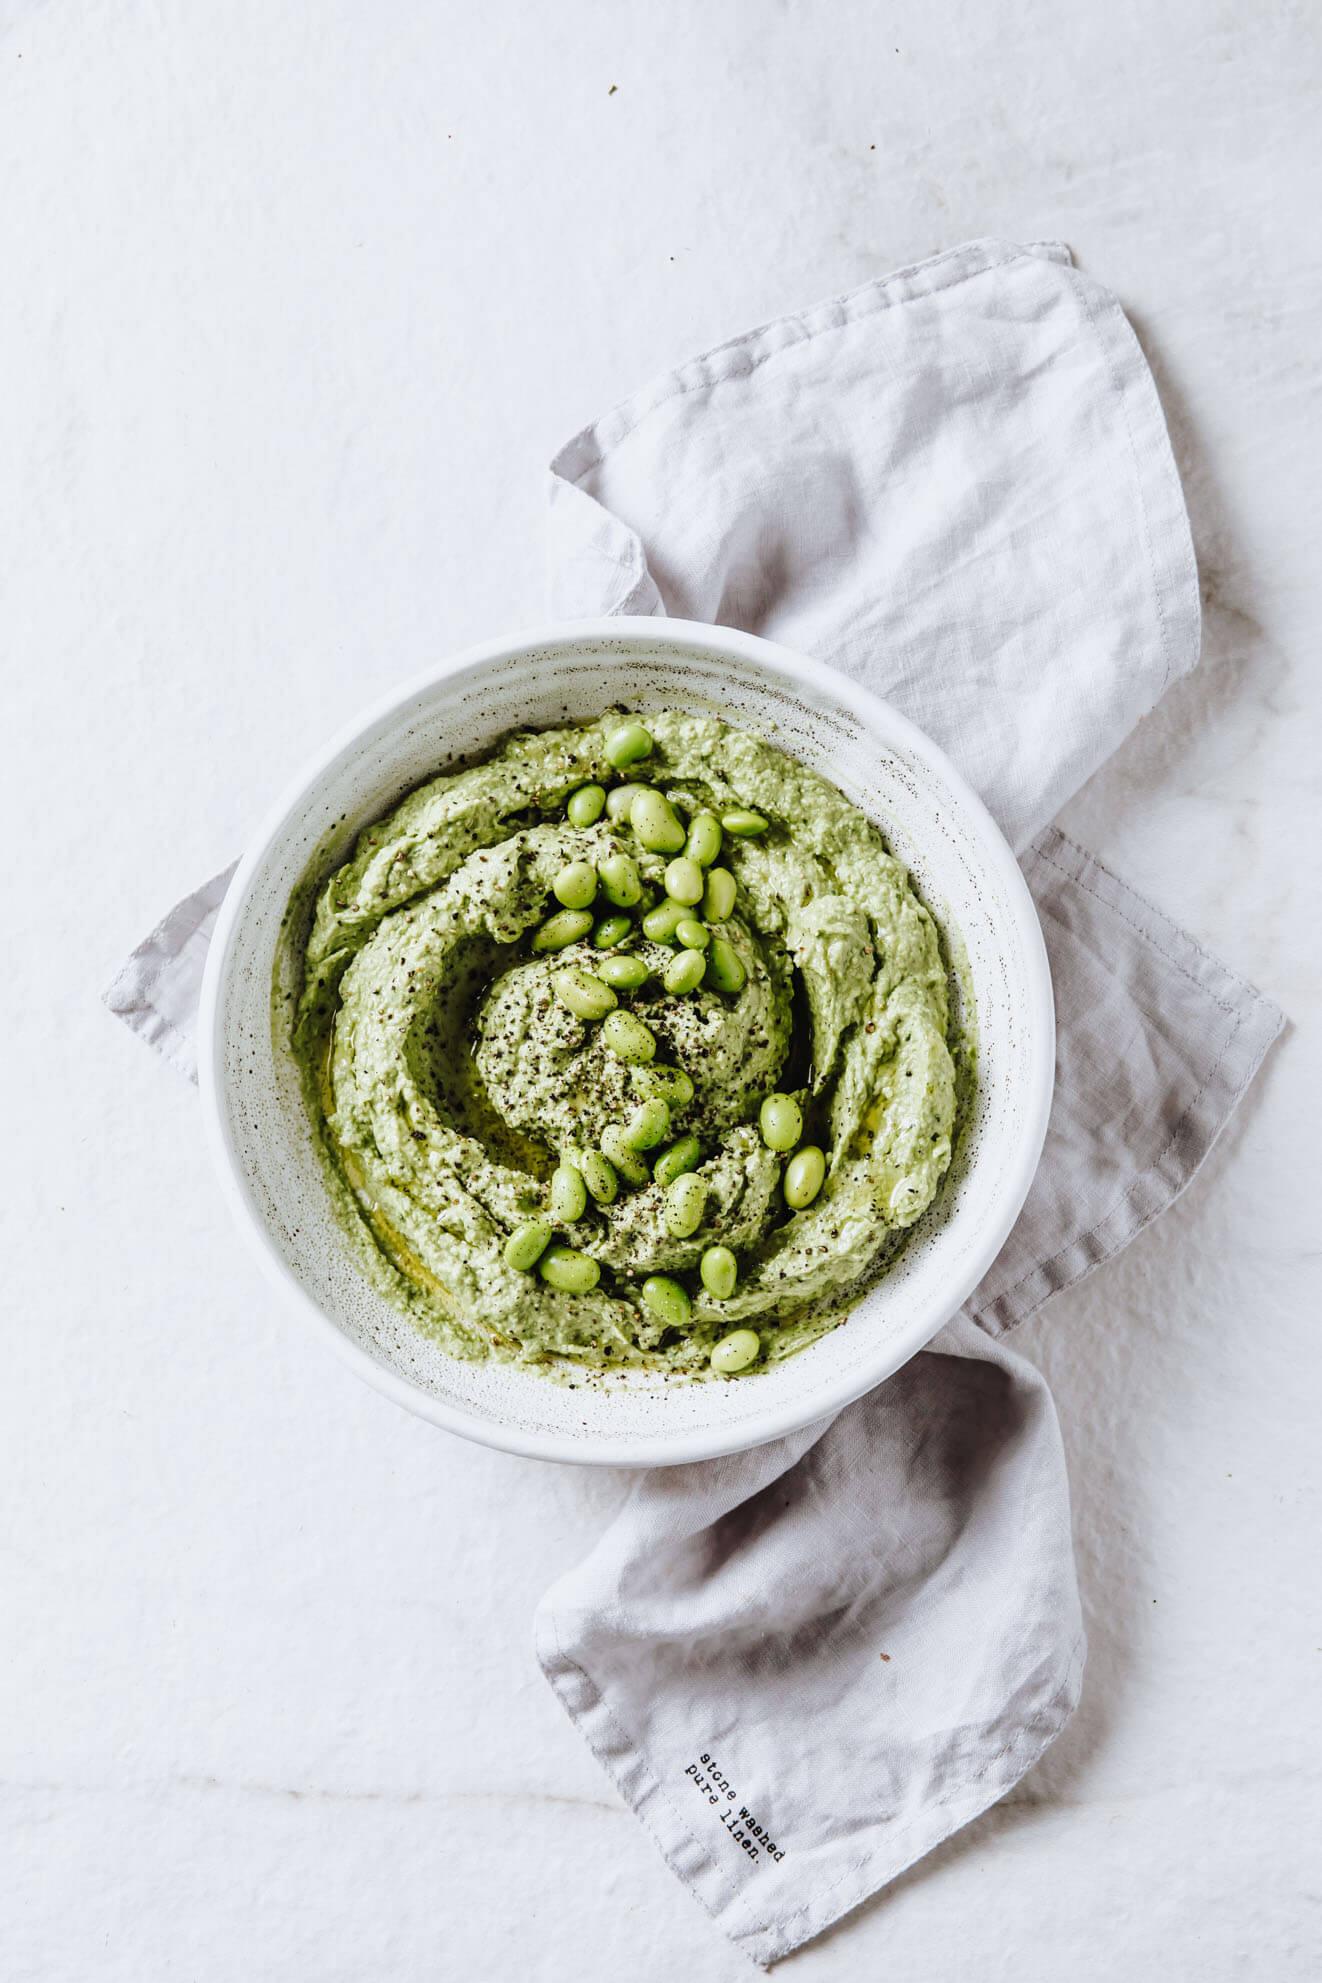 Vegan Avocado and Edamame Dip